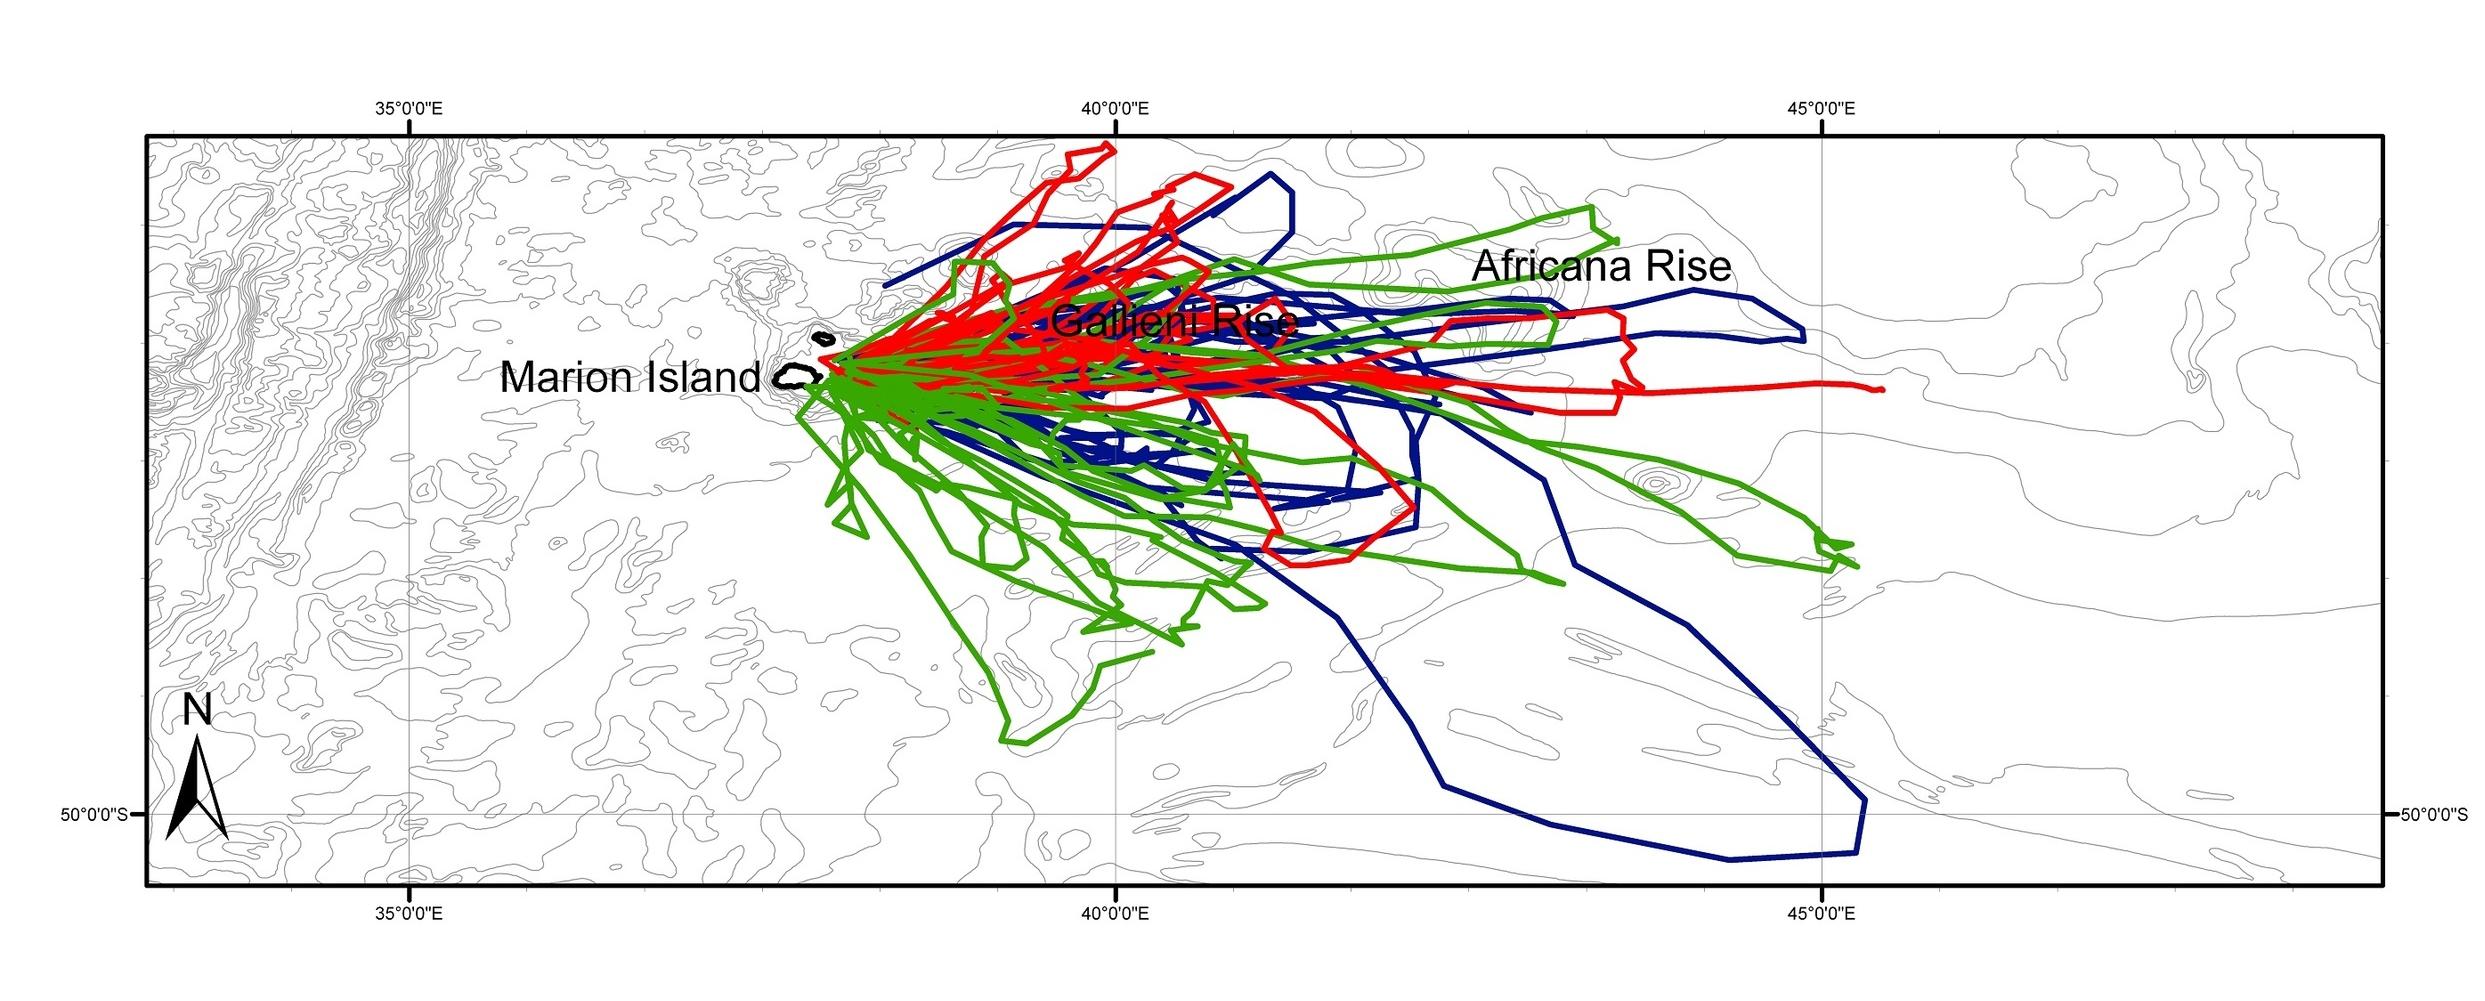 Wege M, Tosh CA, de Bruyn PJN, Bester MN. 2016. Cross-seasonal foraging site fidelity of subantarctic fur seals: implications for marine conservation areas. Marine Ecology Progress Series 554: 225-239